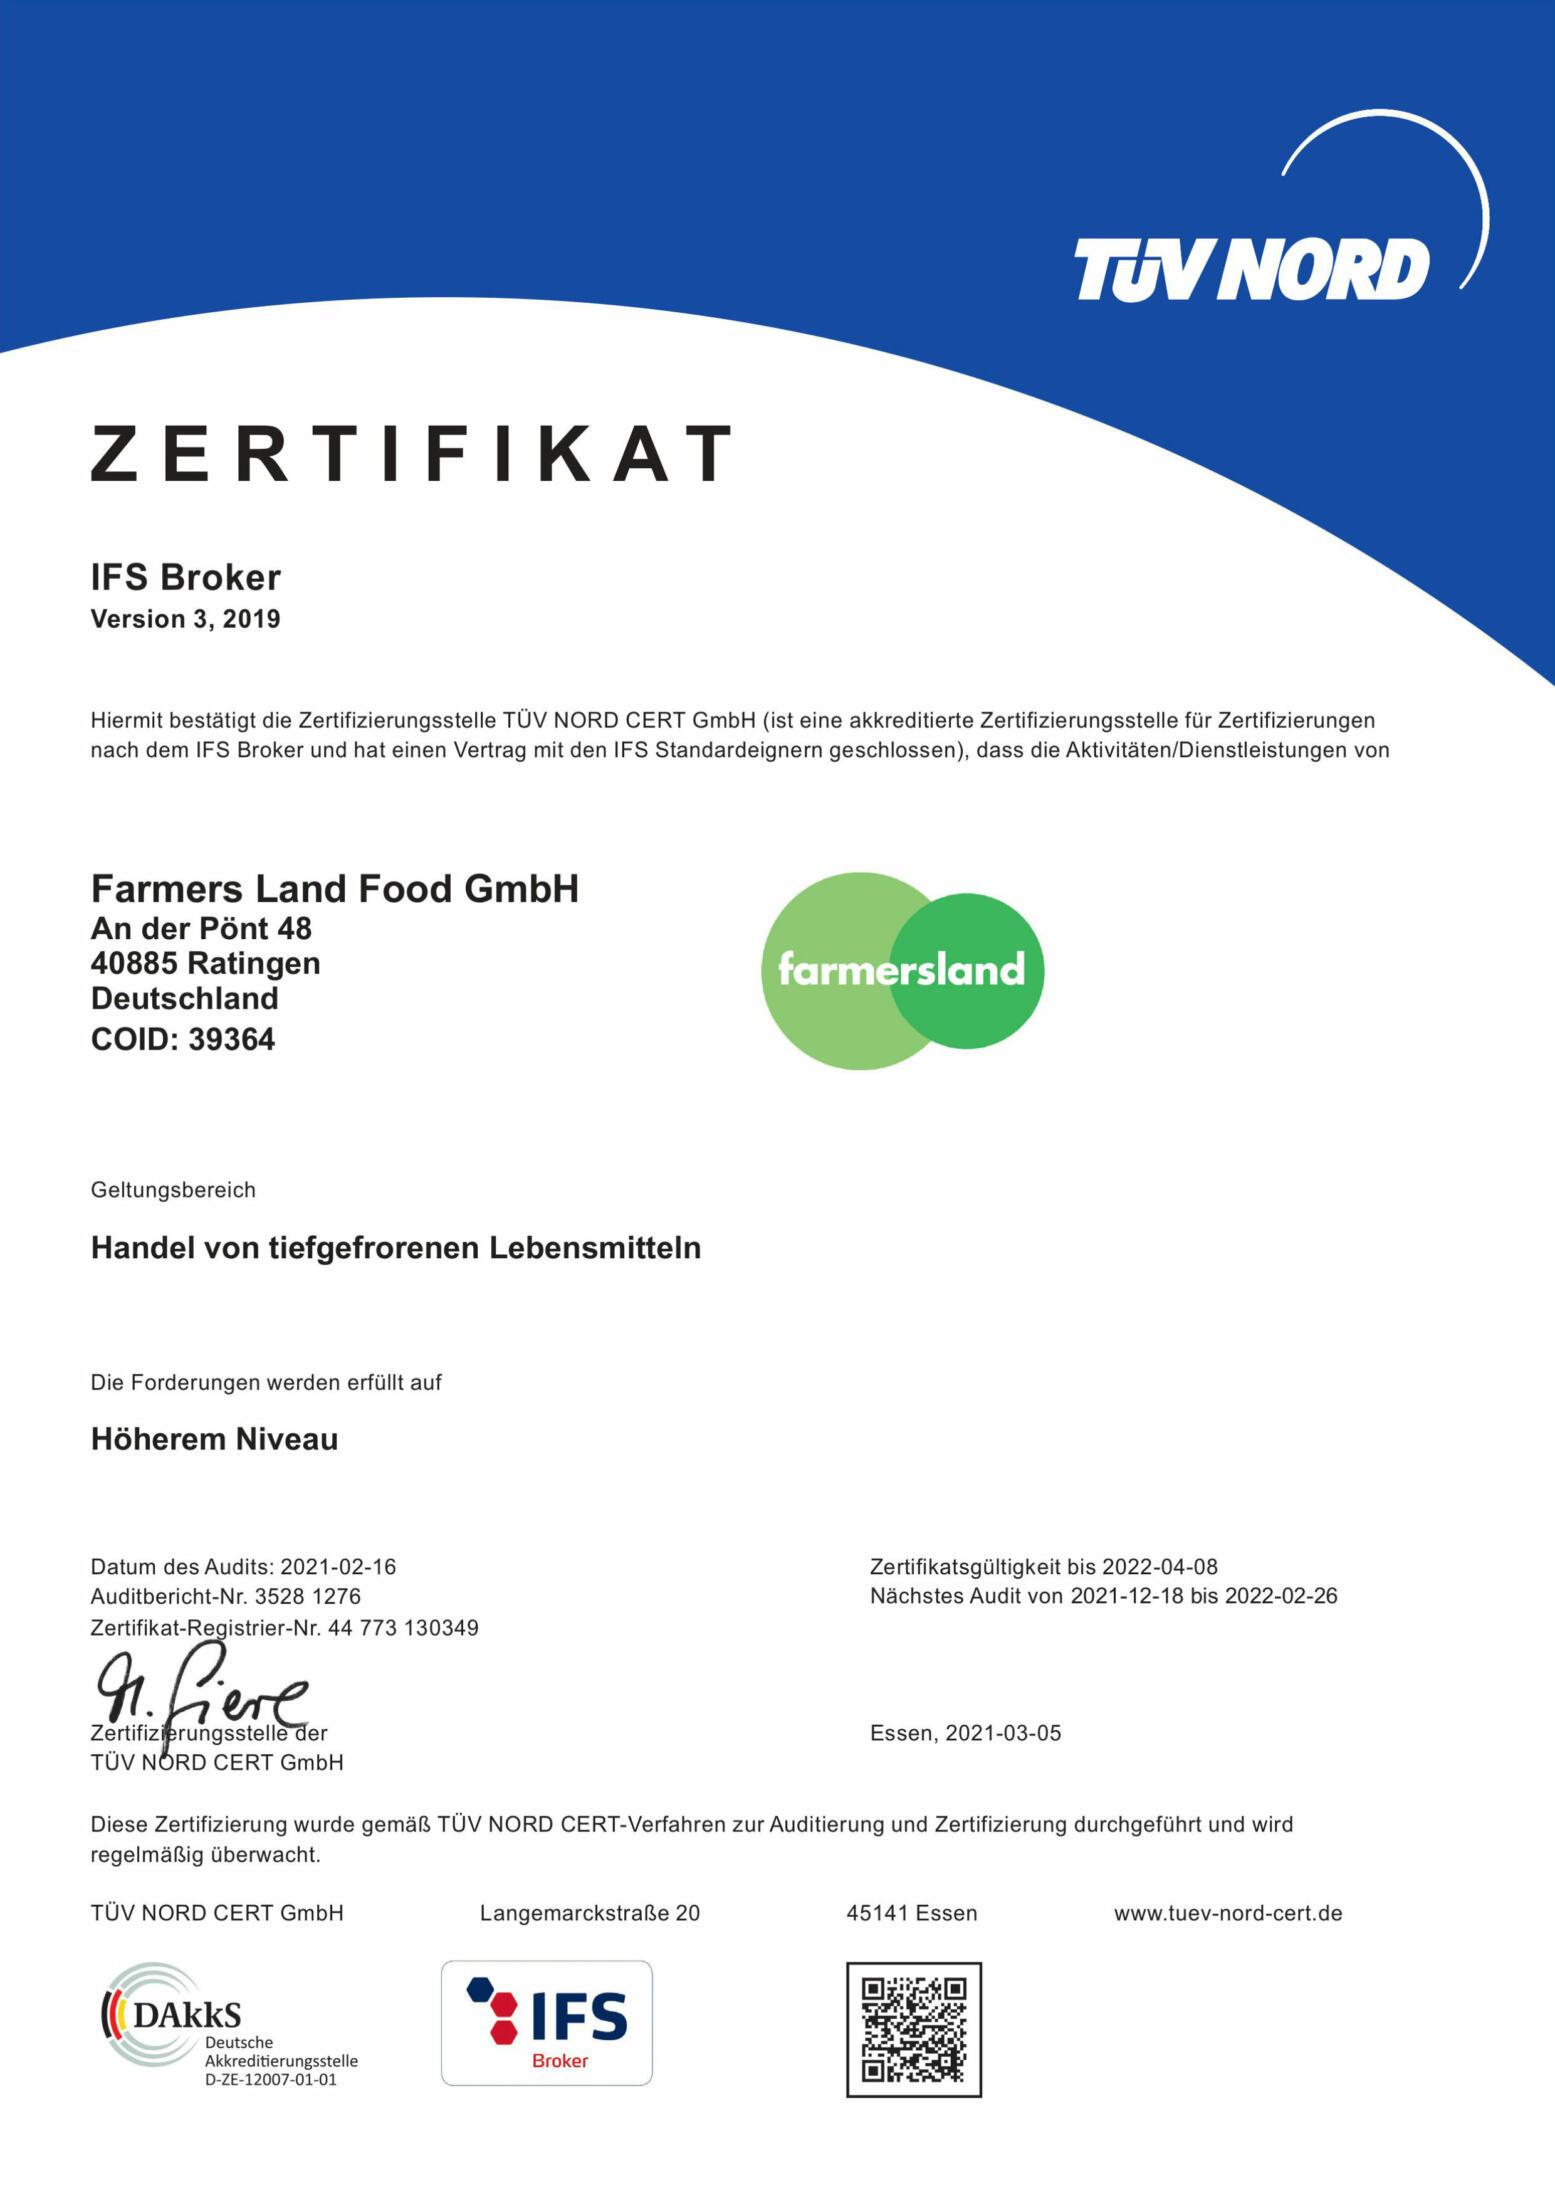 IFS-Zertifikat 2021 / 2022